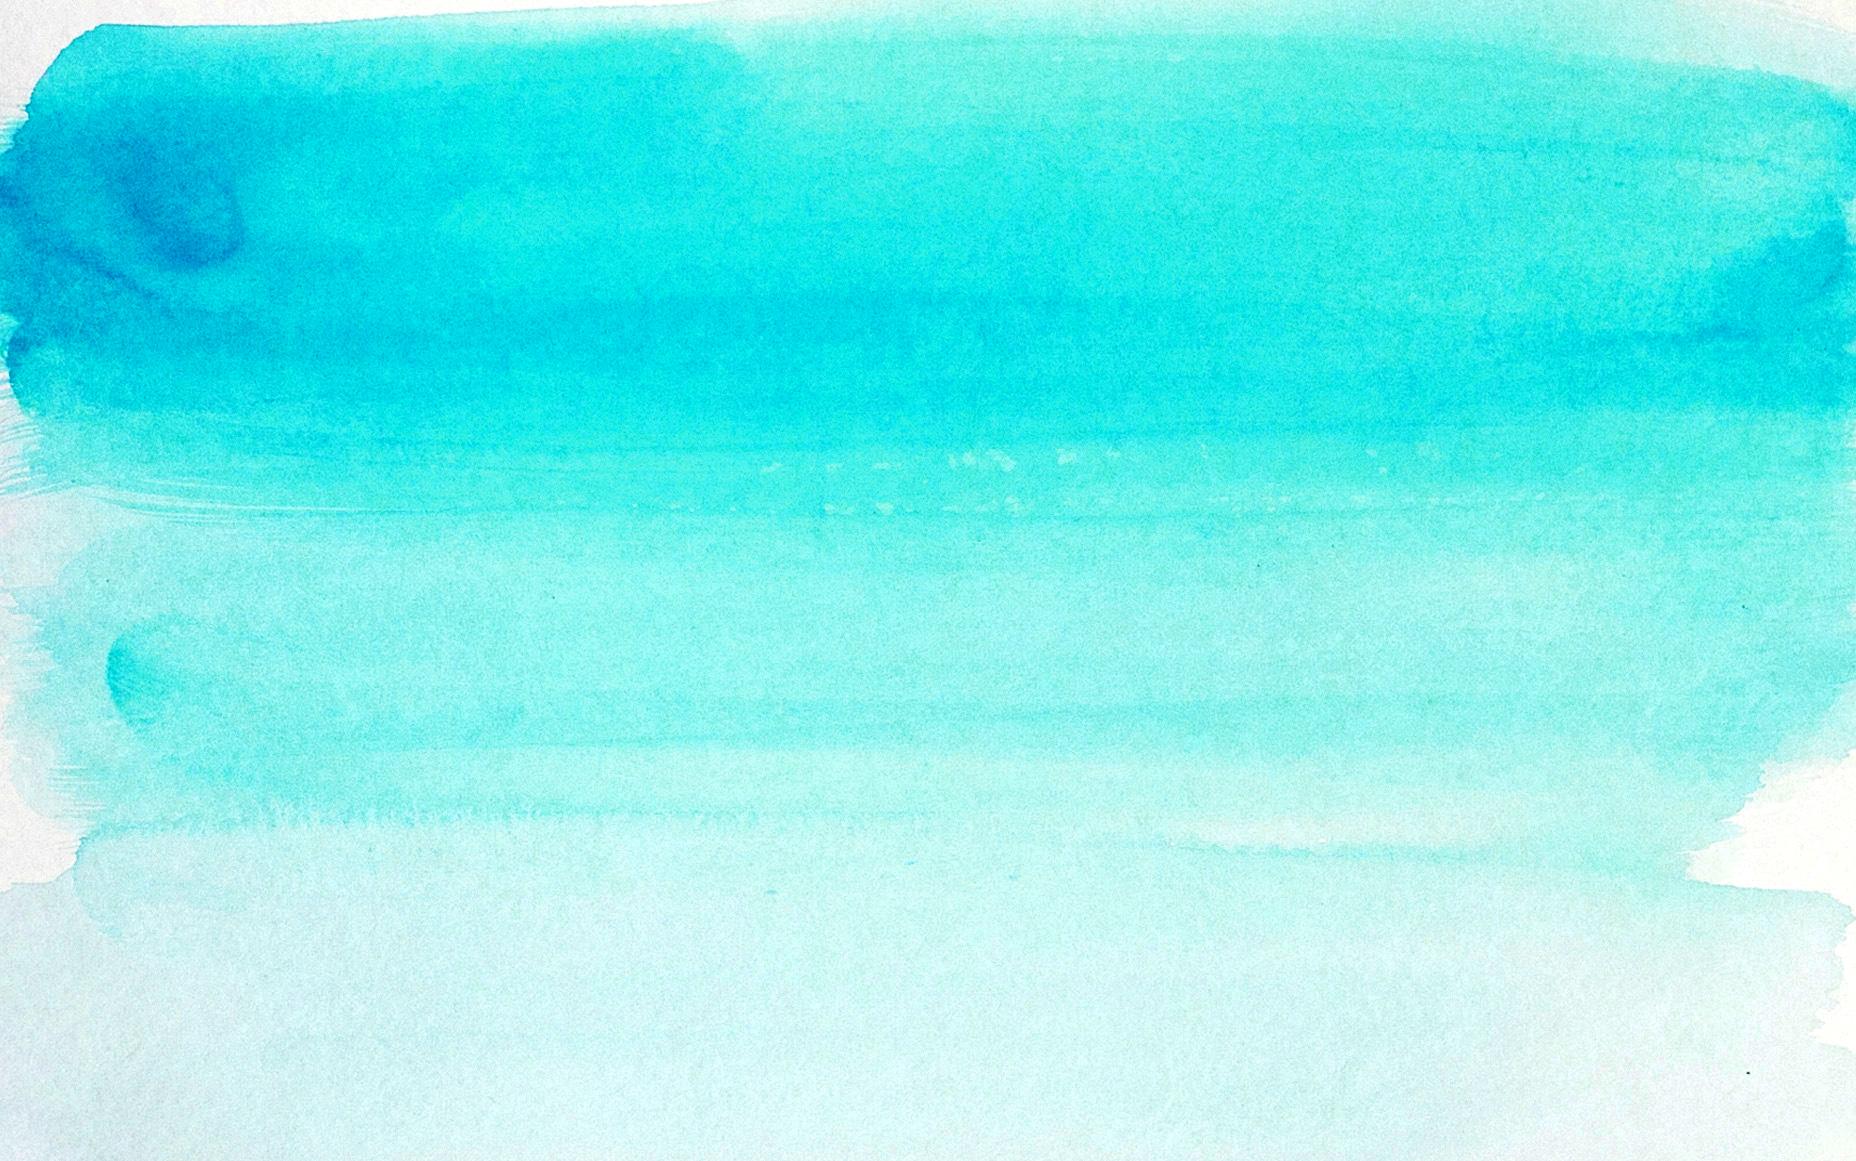 Tiffany Blue Wallpapers Tumblr Kl005 Yeesy